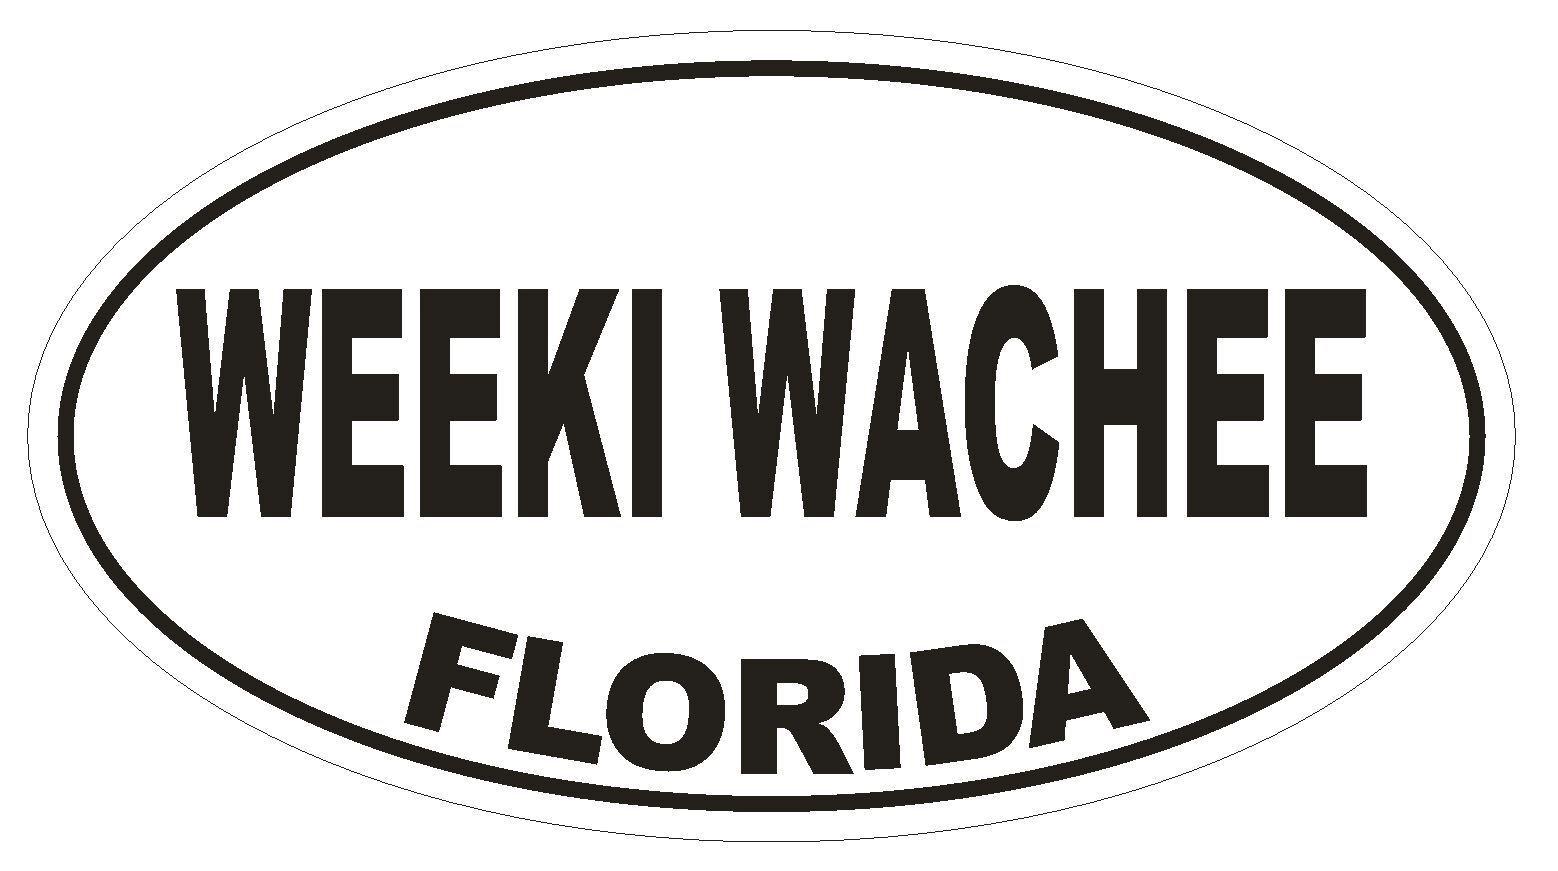 Weeki Wachee Florida Oval Bumper Sticker or Helmet Sticker D2643 Euro Decal